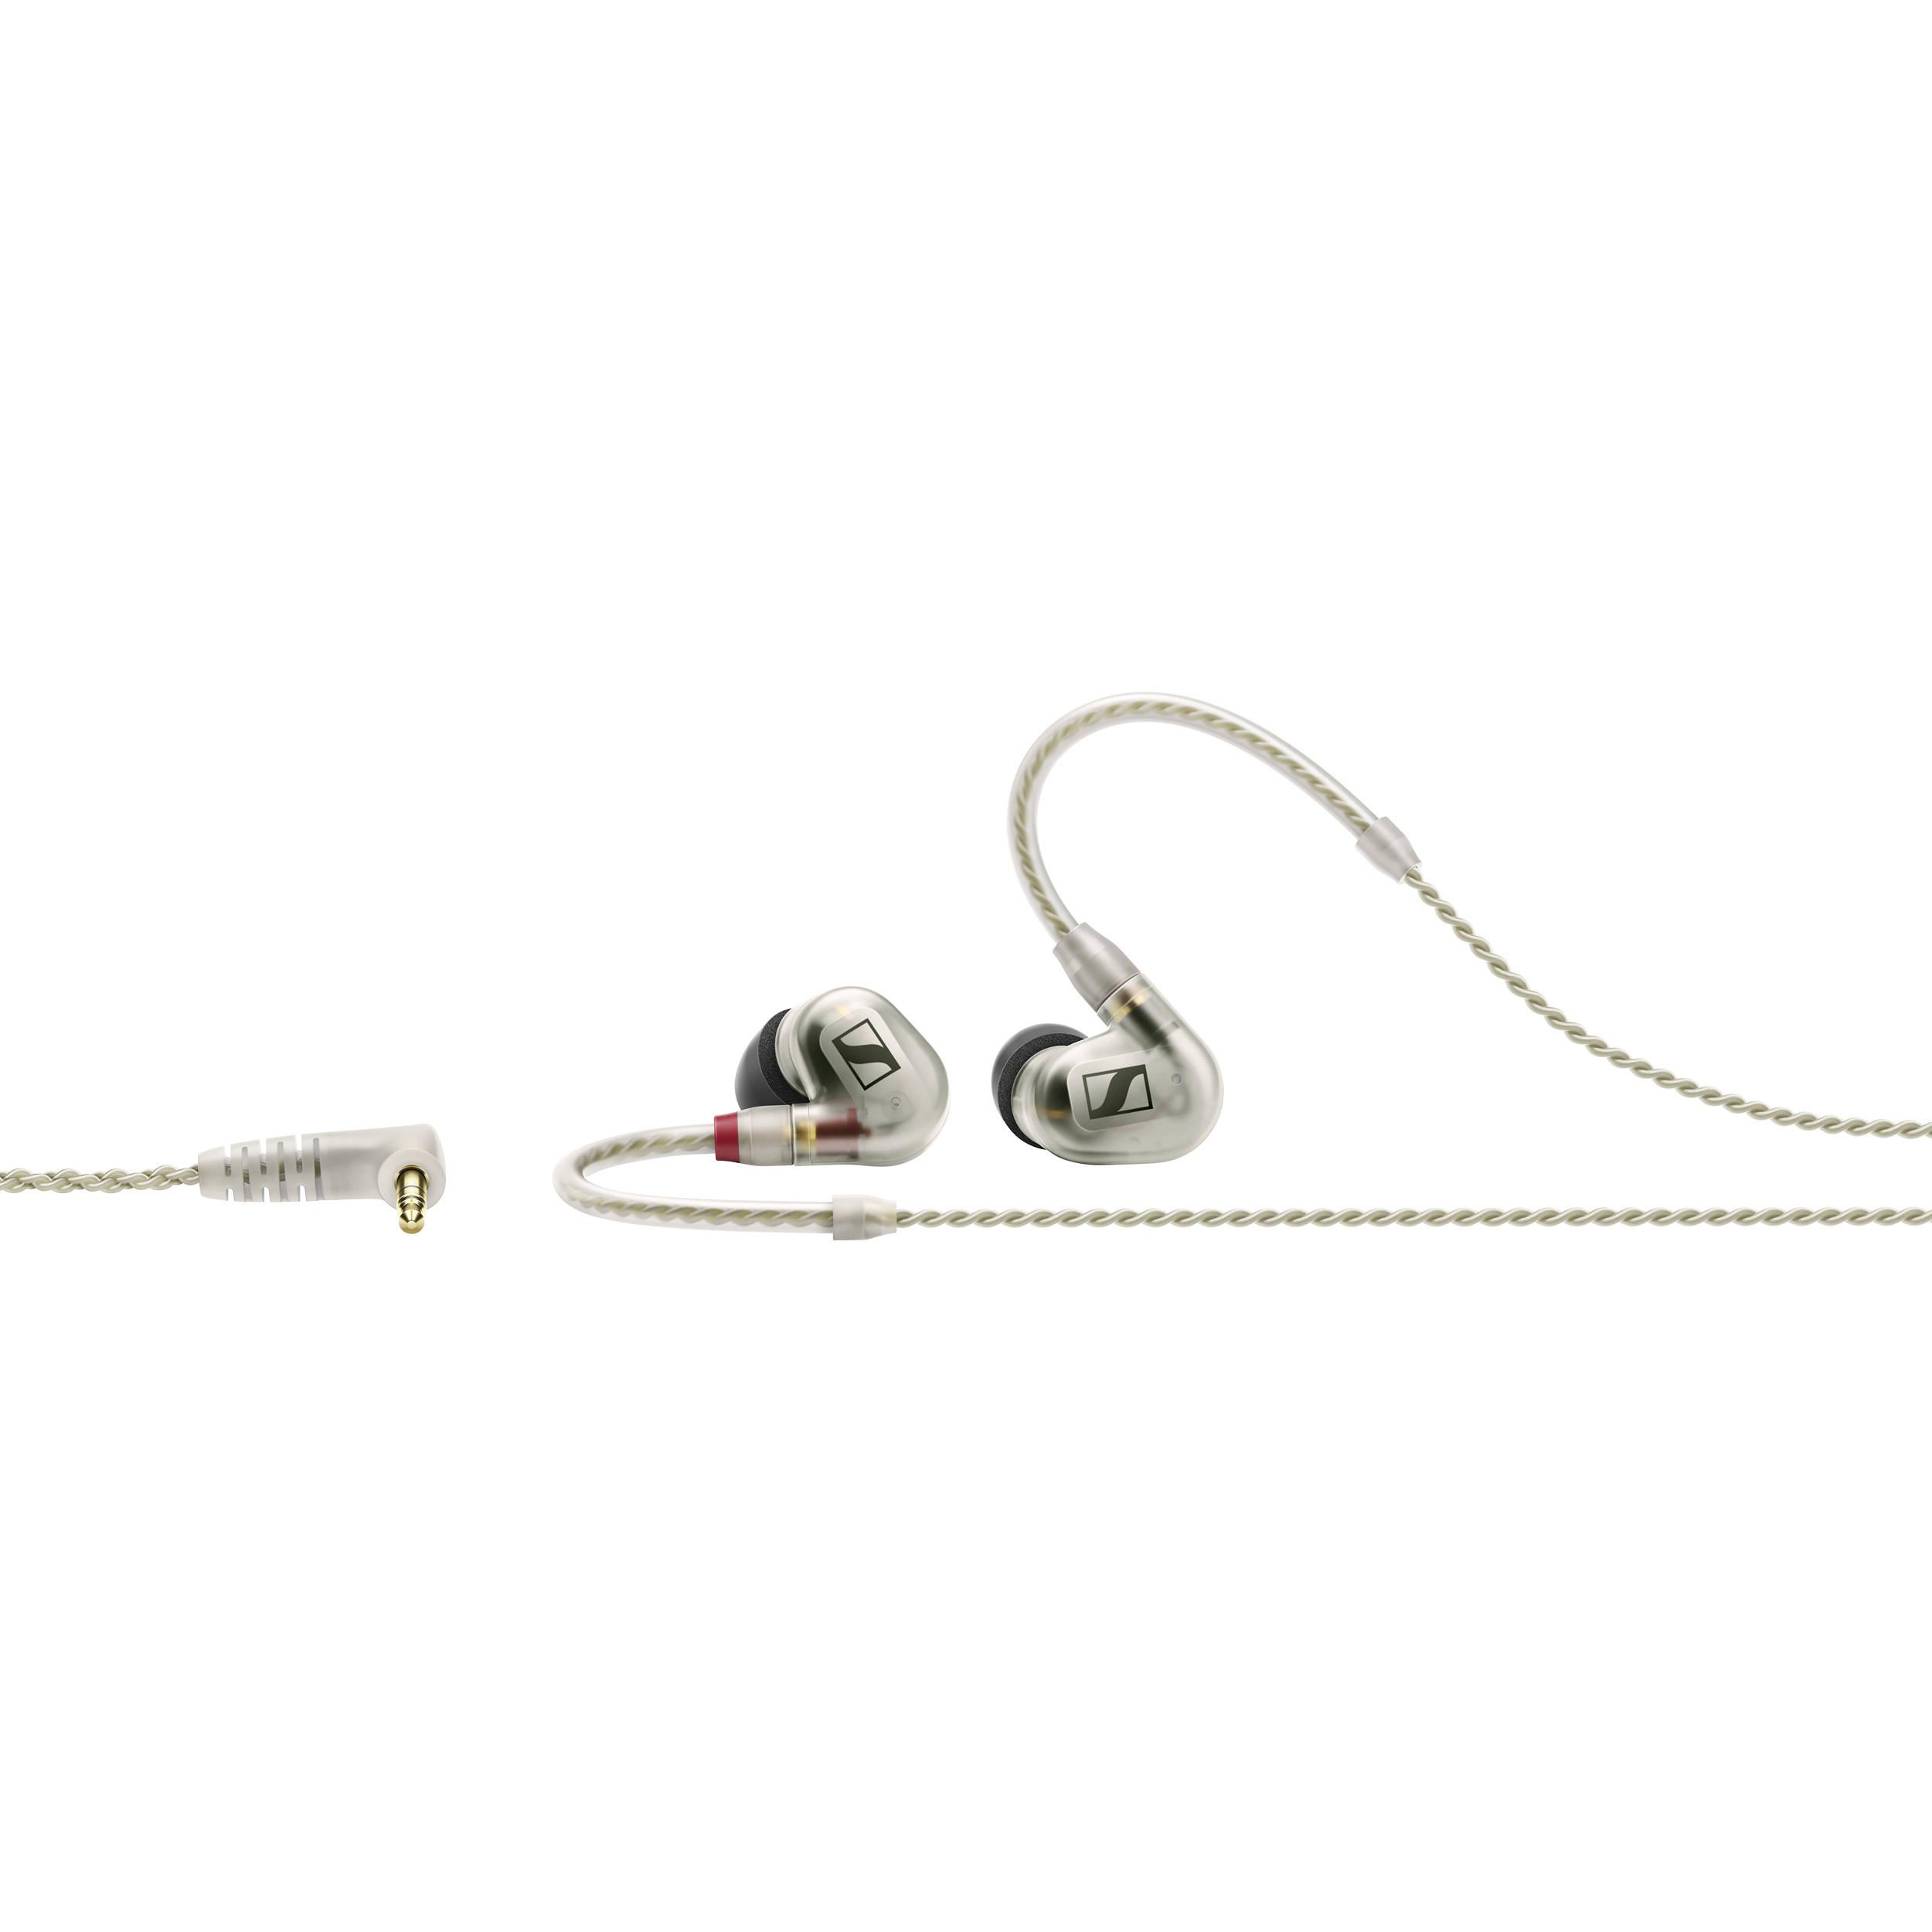 Sennheiser IE 500 Pro Headphones